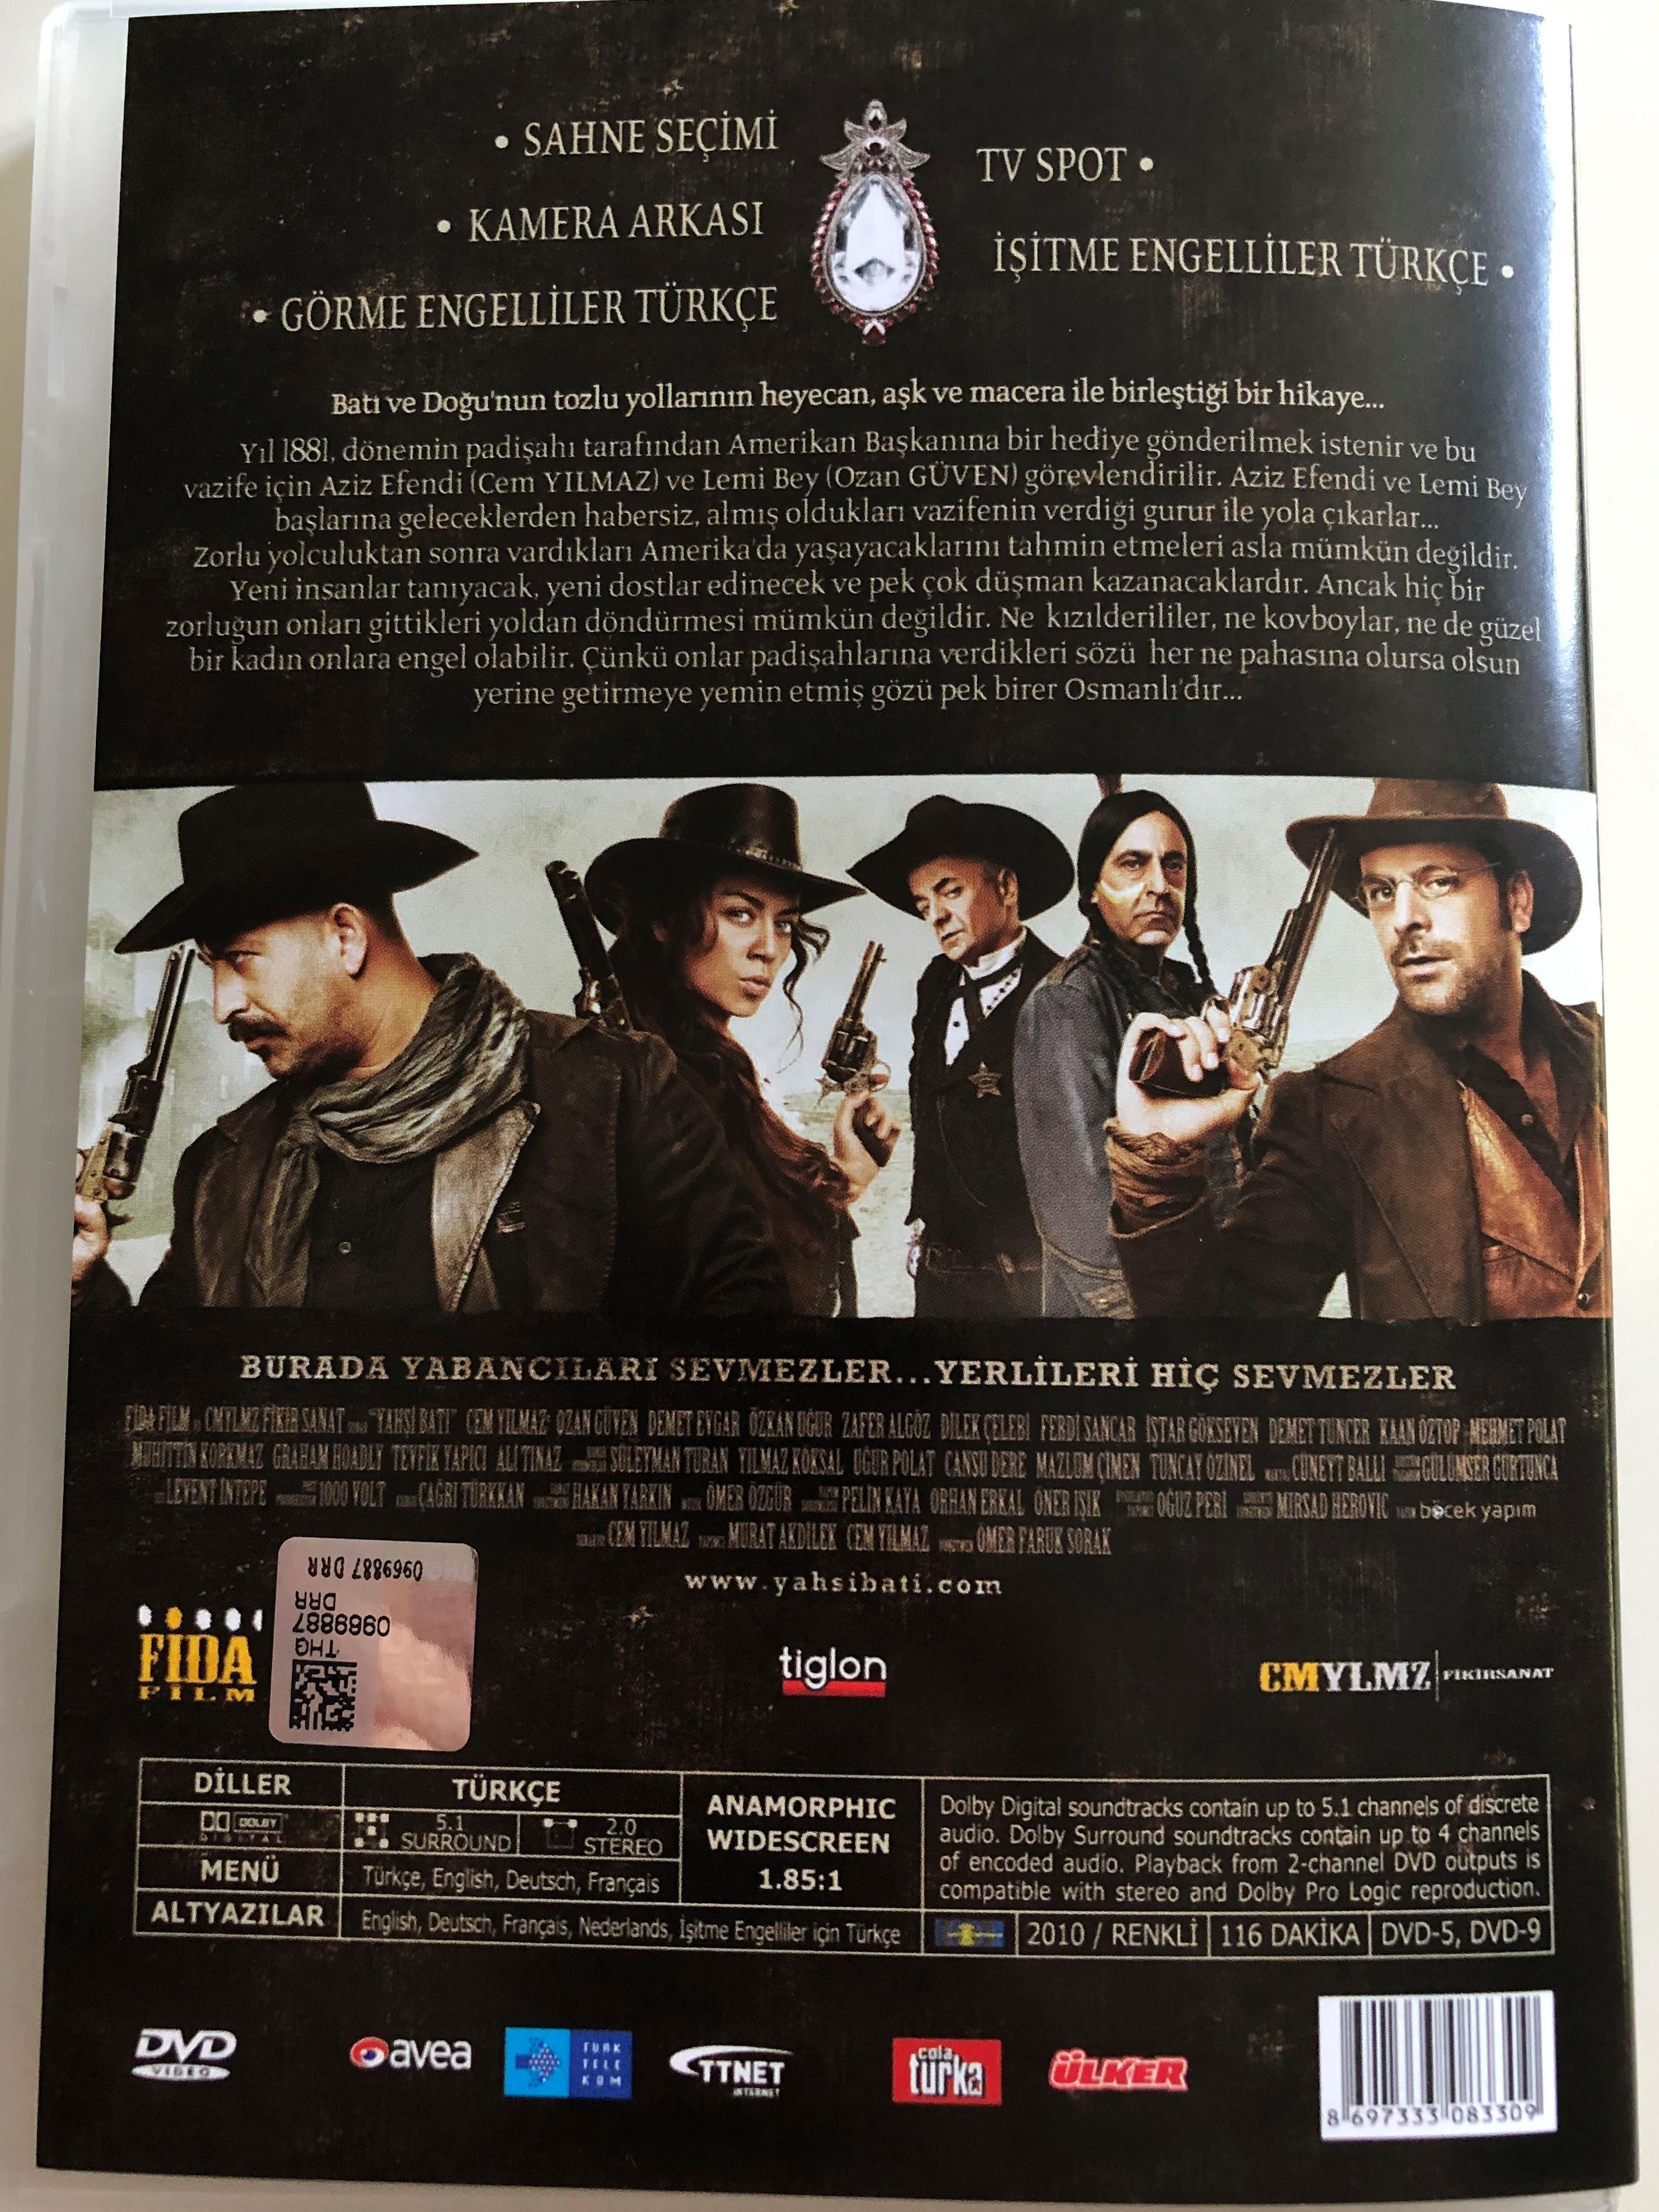 yah-i-bat-dvd-2010-directed-by-mer-faruk-sorak-starring-cem-y-lmaz-ozan-g-ven-demet-evgar-zkan-u-ur-zafer-alg-z-turkish-western-comedy-2-.jpg